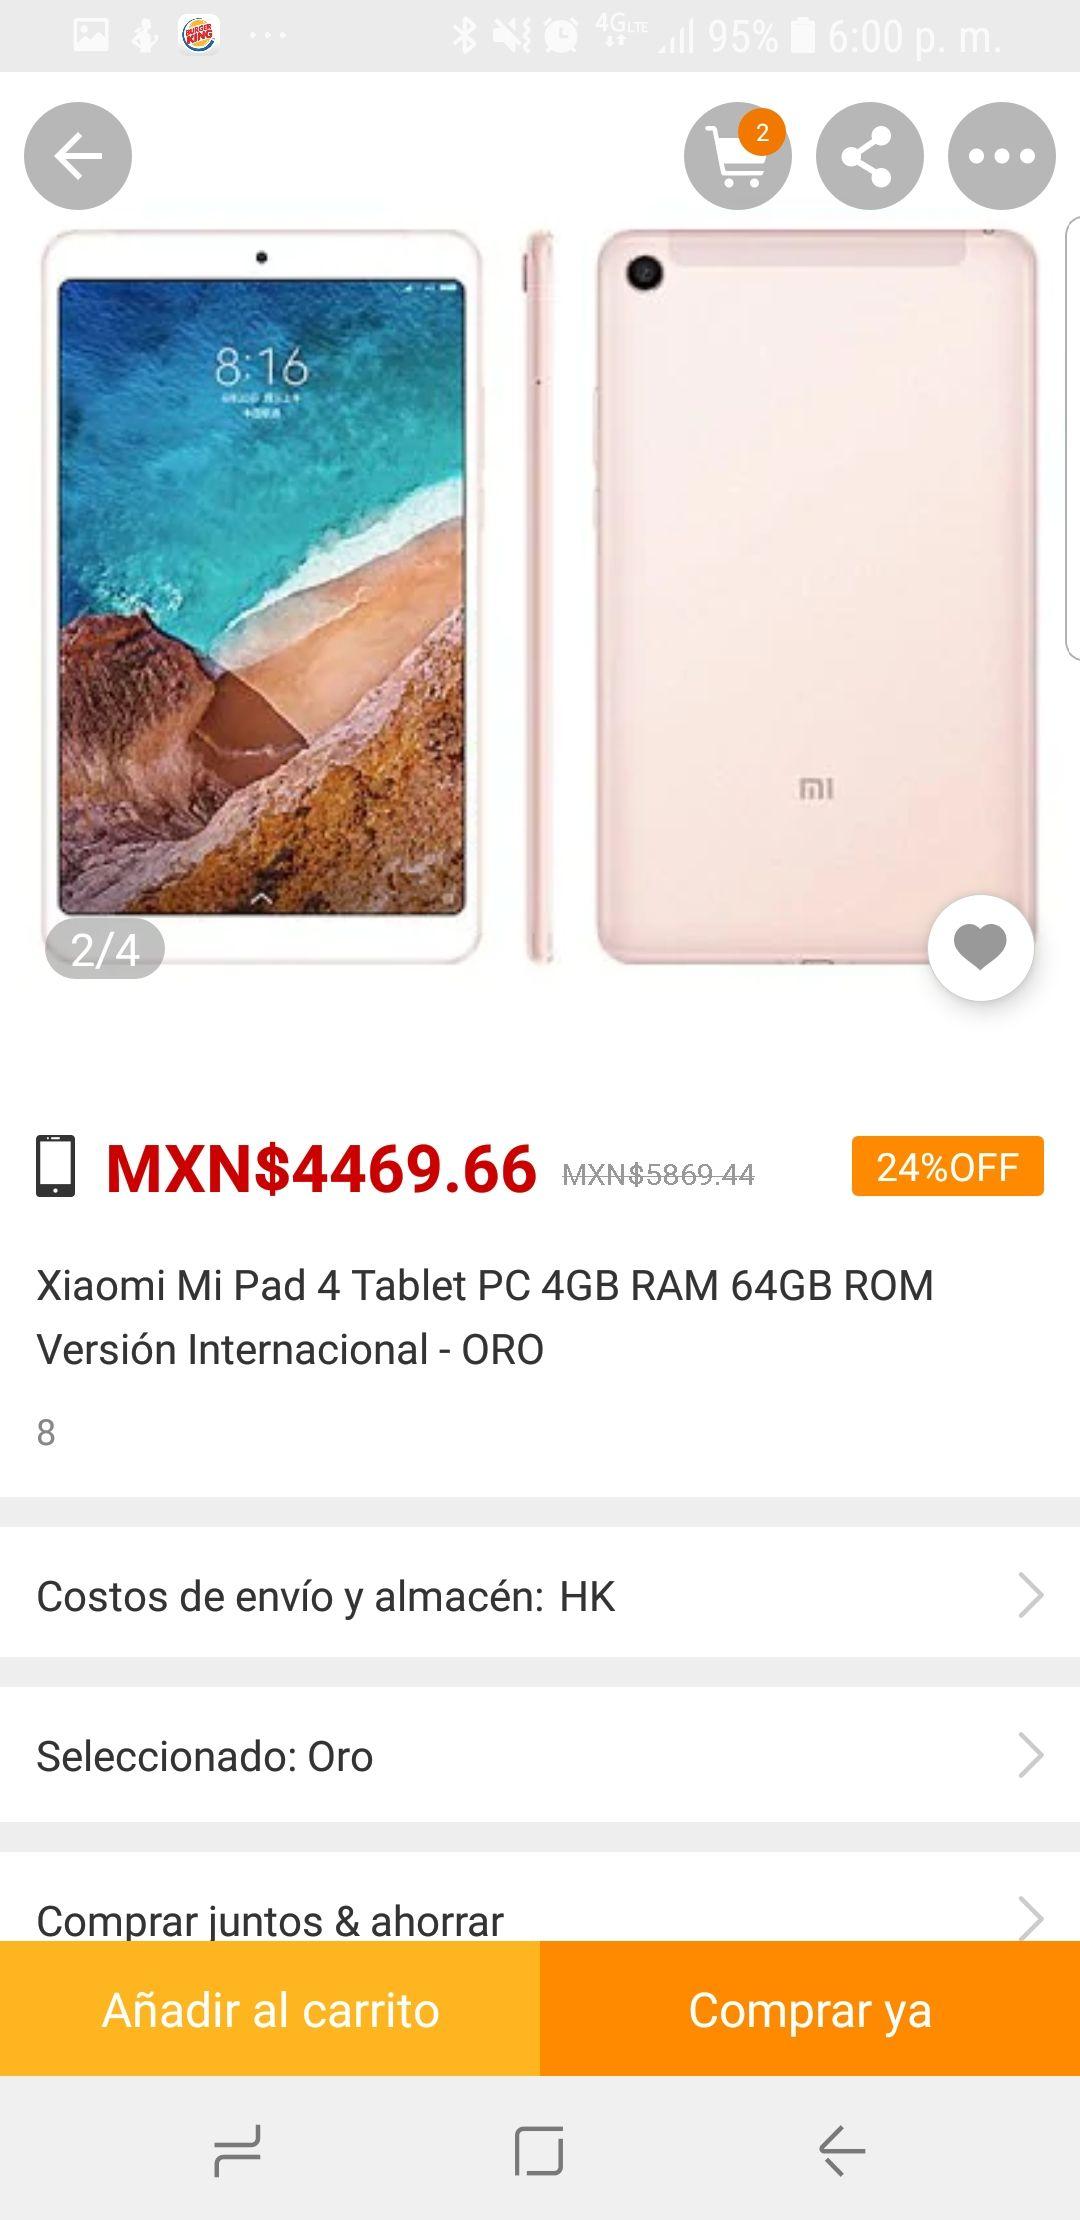 Gearbest: Xiaomi mi Pad 4 64gb/4gb ram version internacional